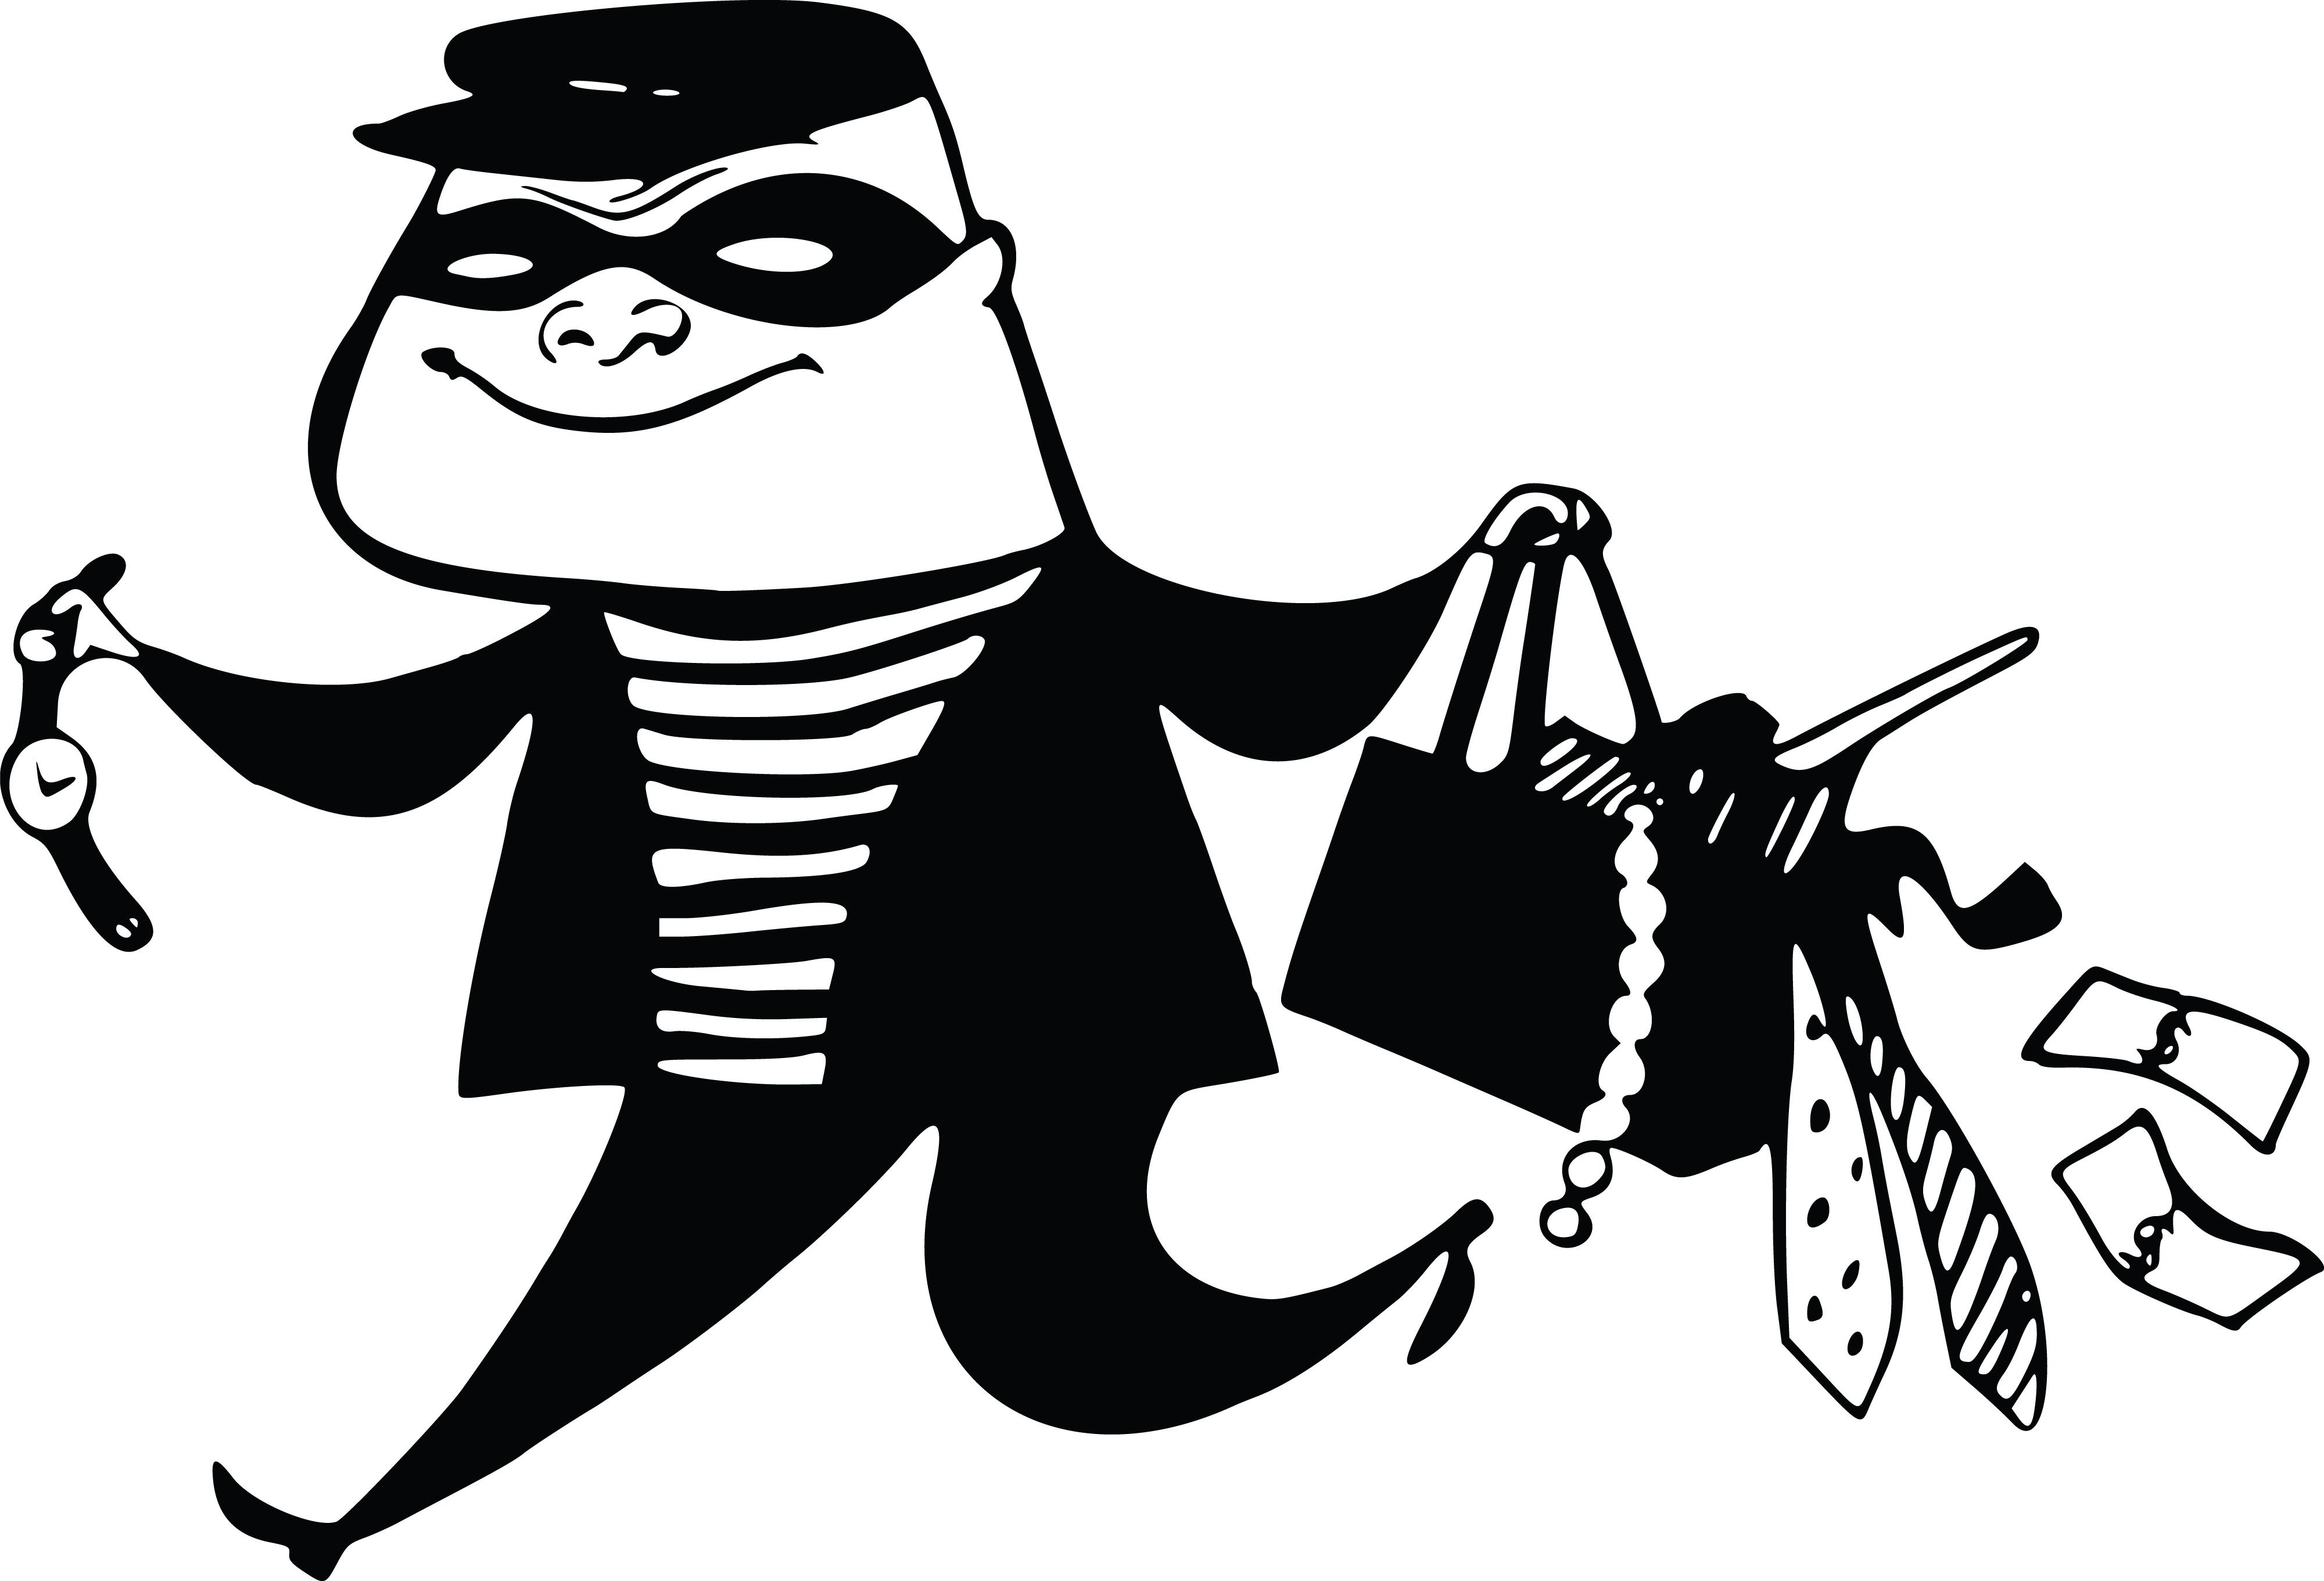 Free Clipart Of A burglar running away.